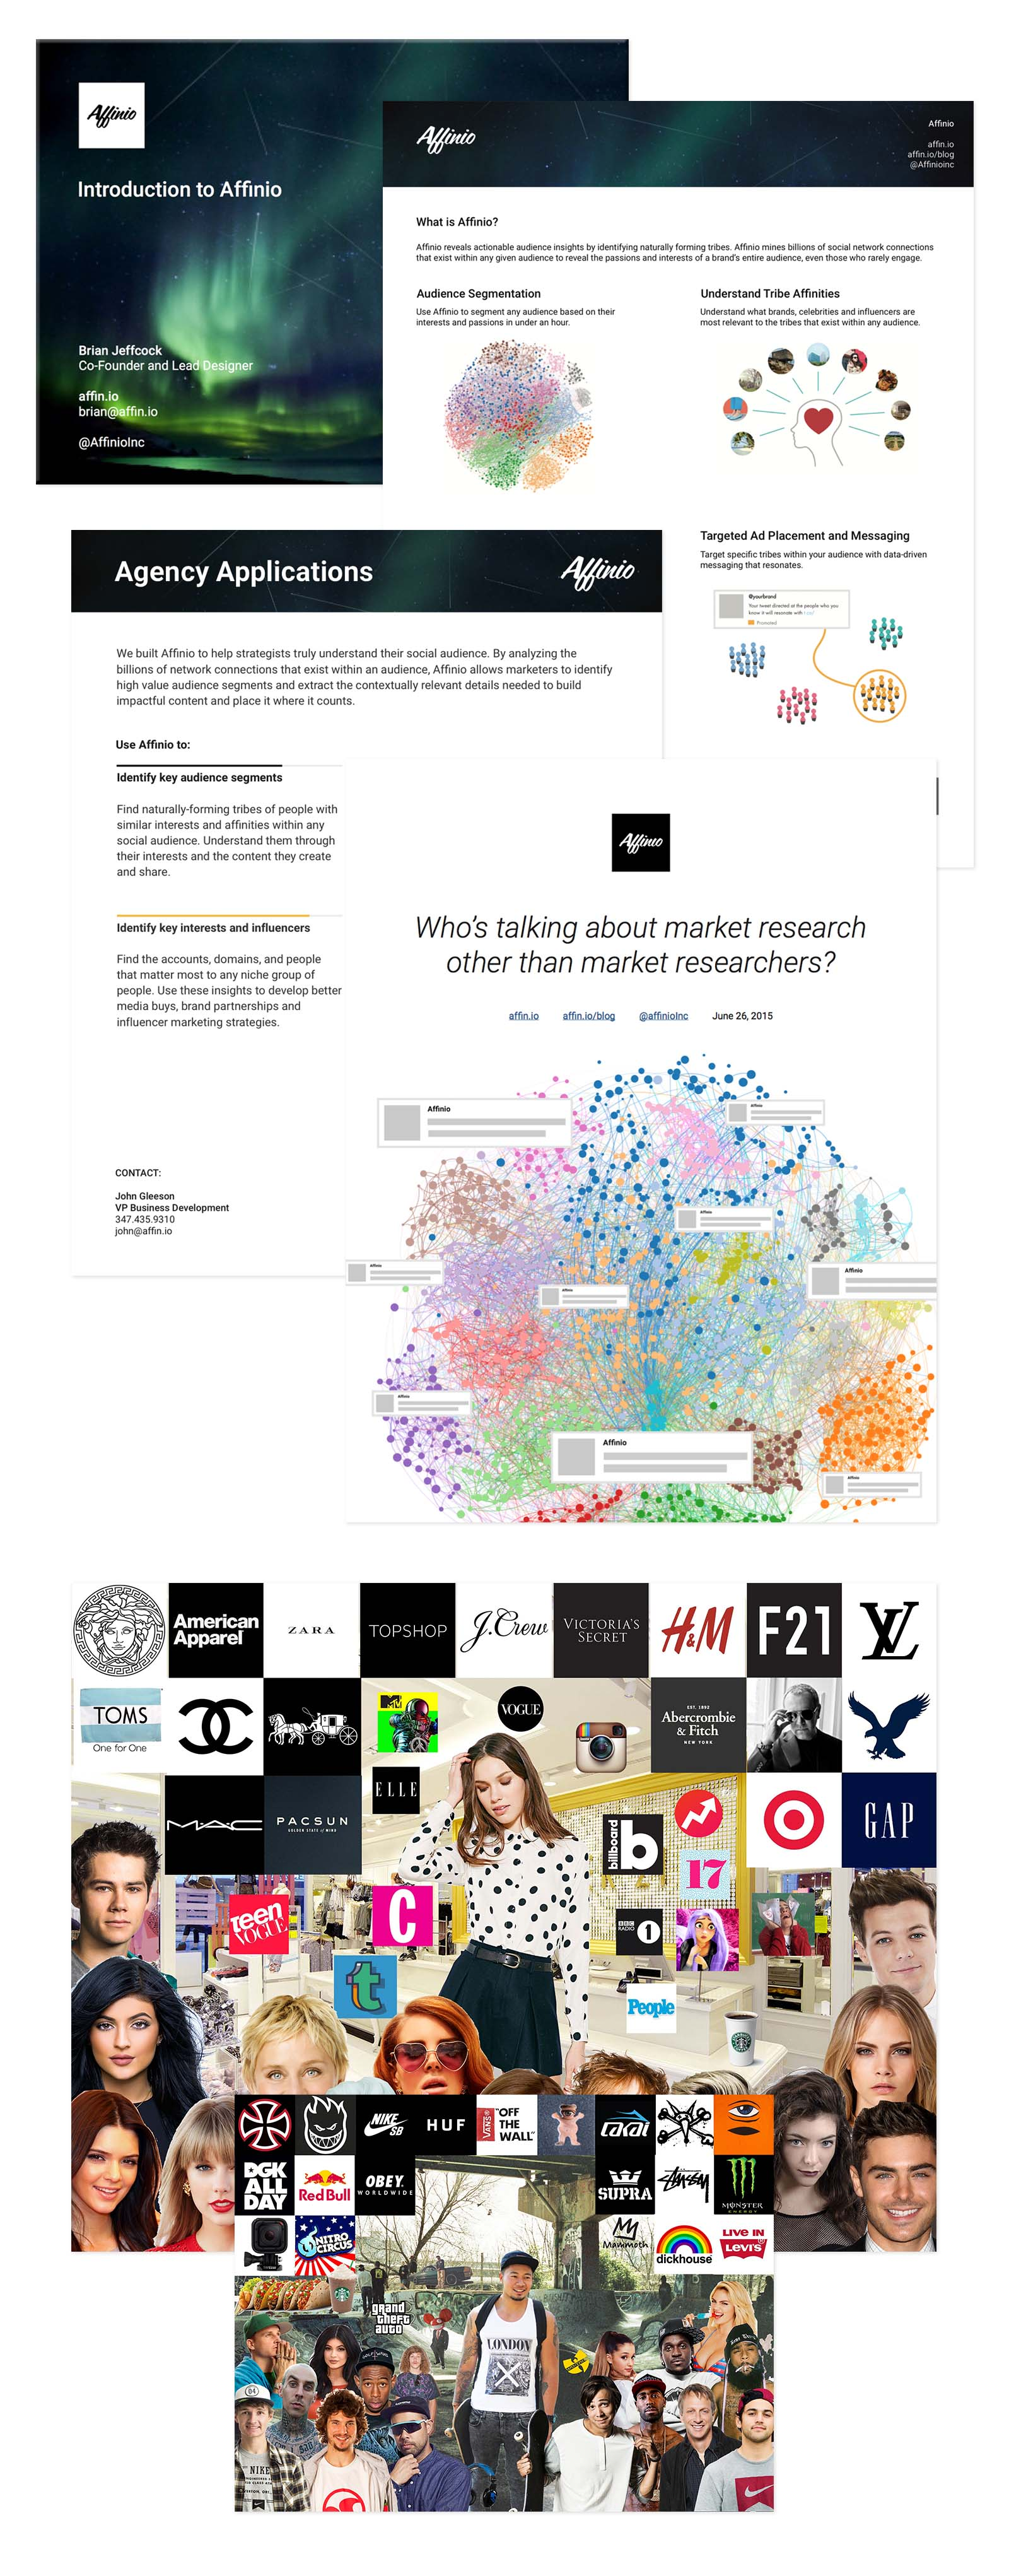 affinio-marketing-samples.jpg